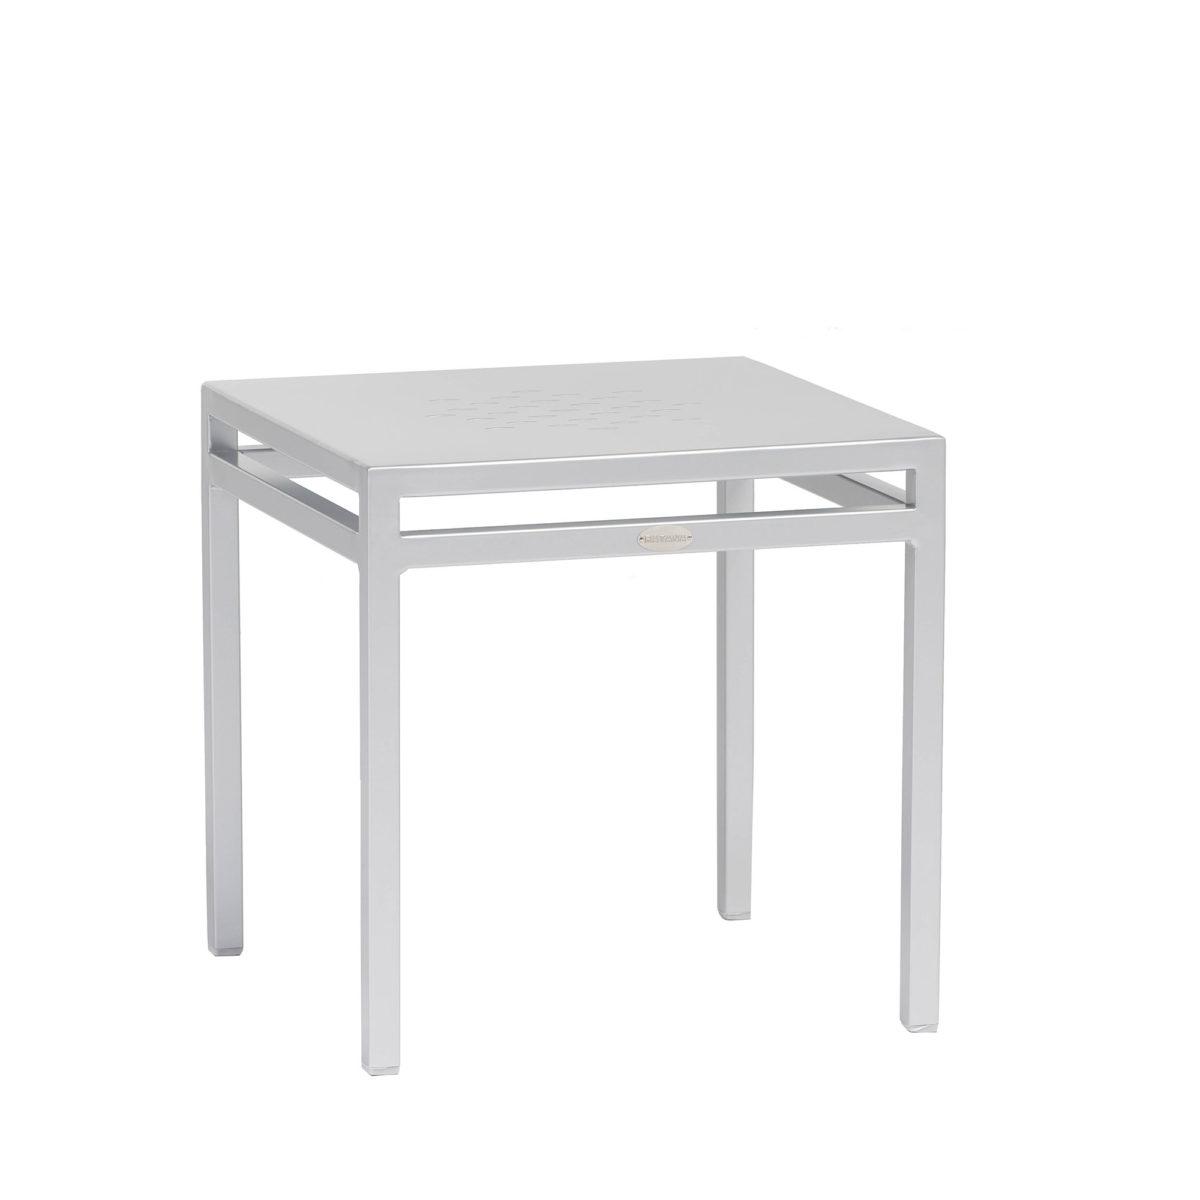 Toscana side table grey